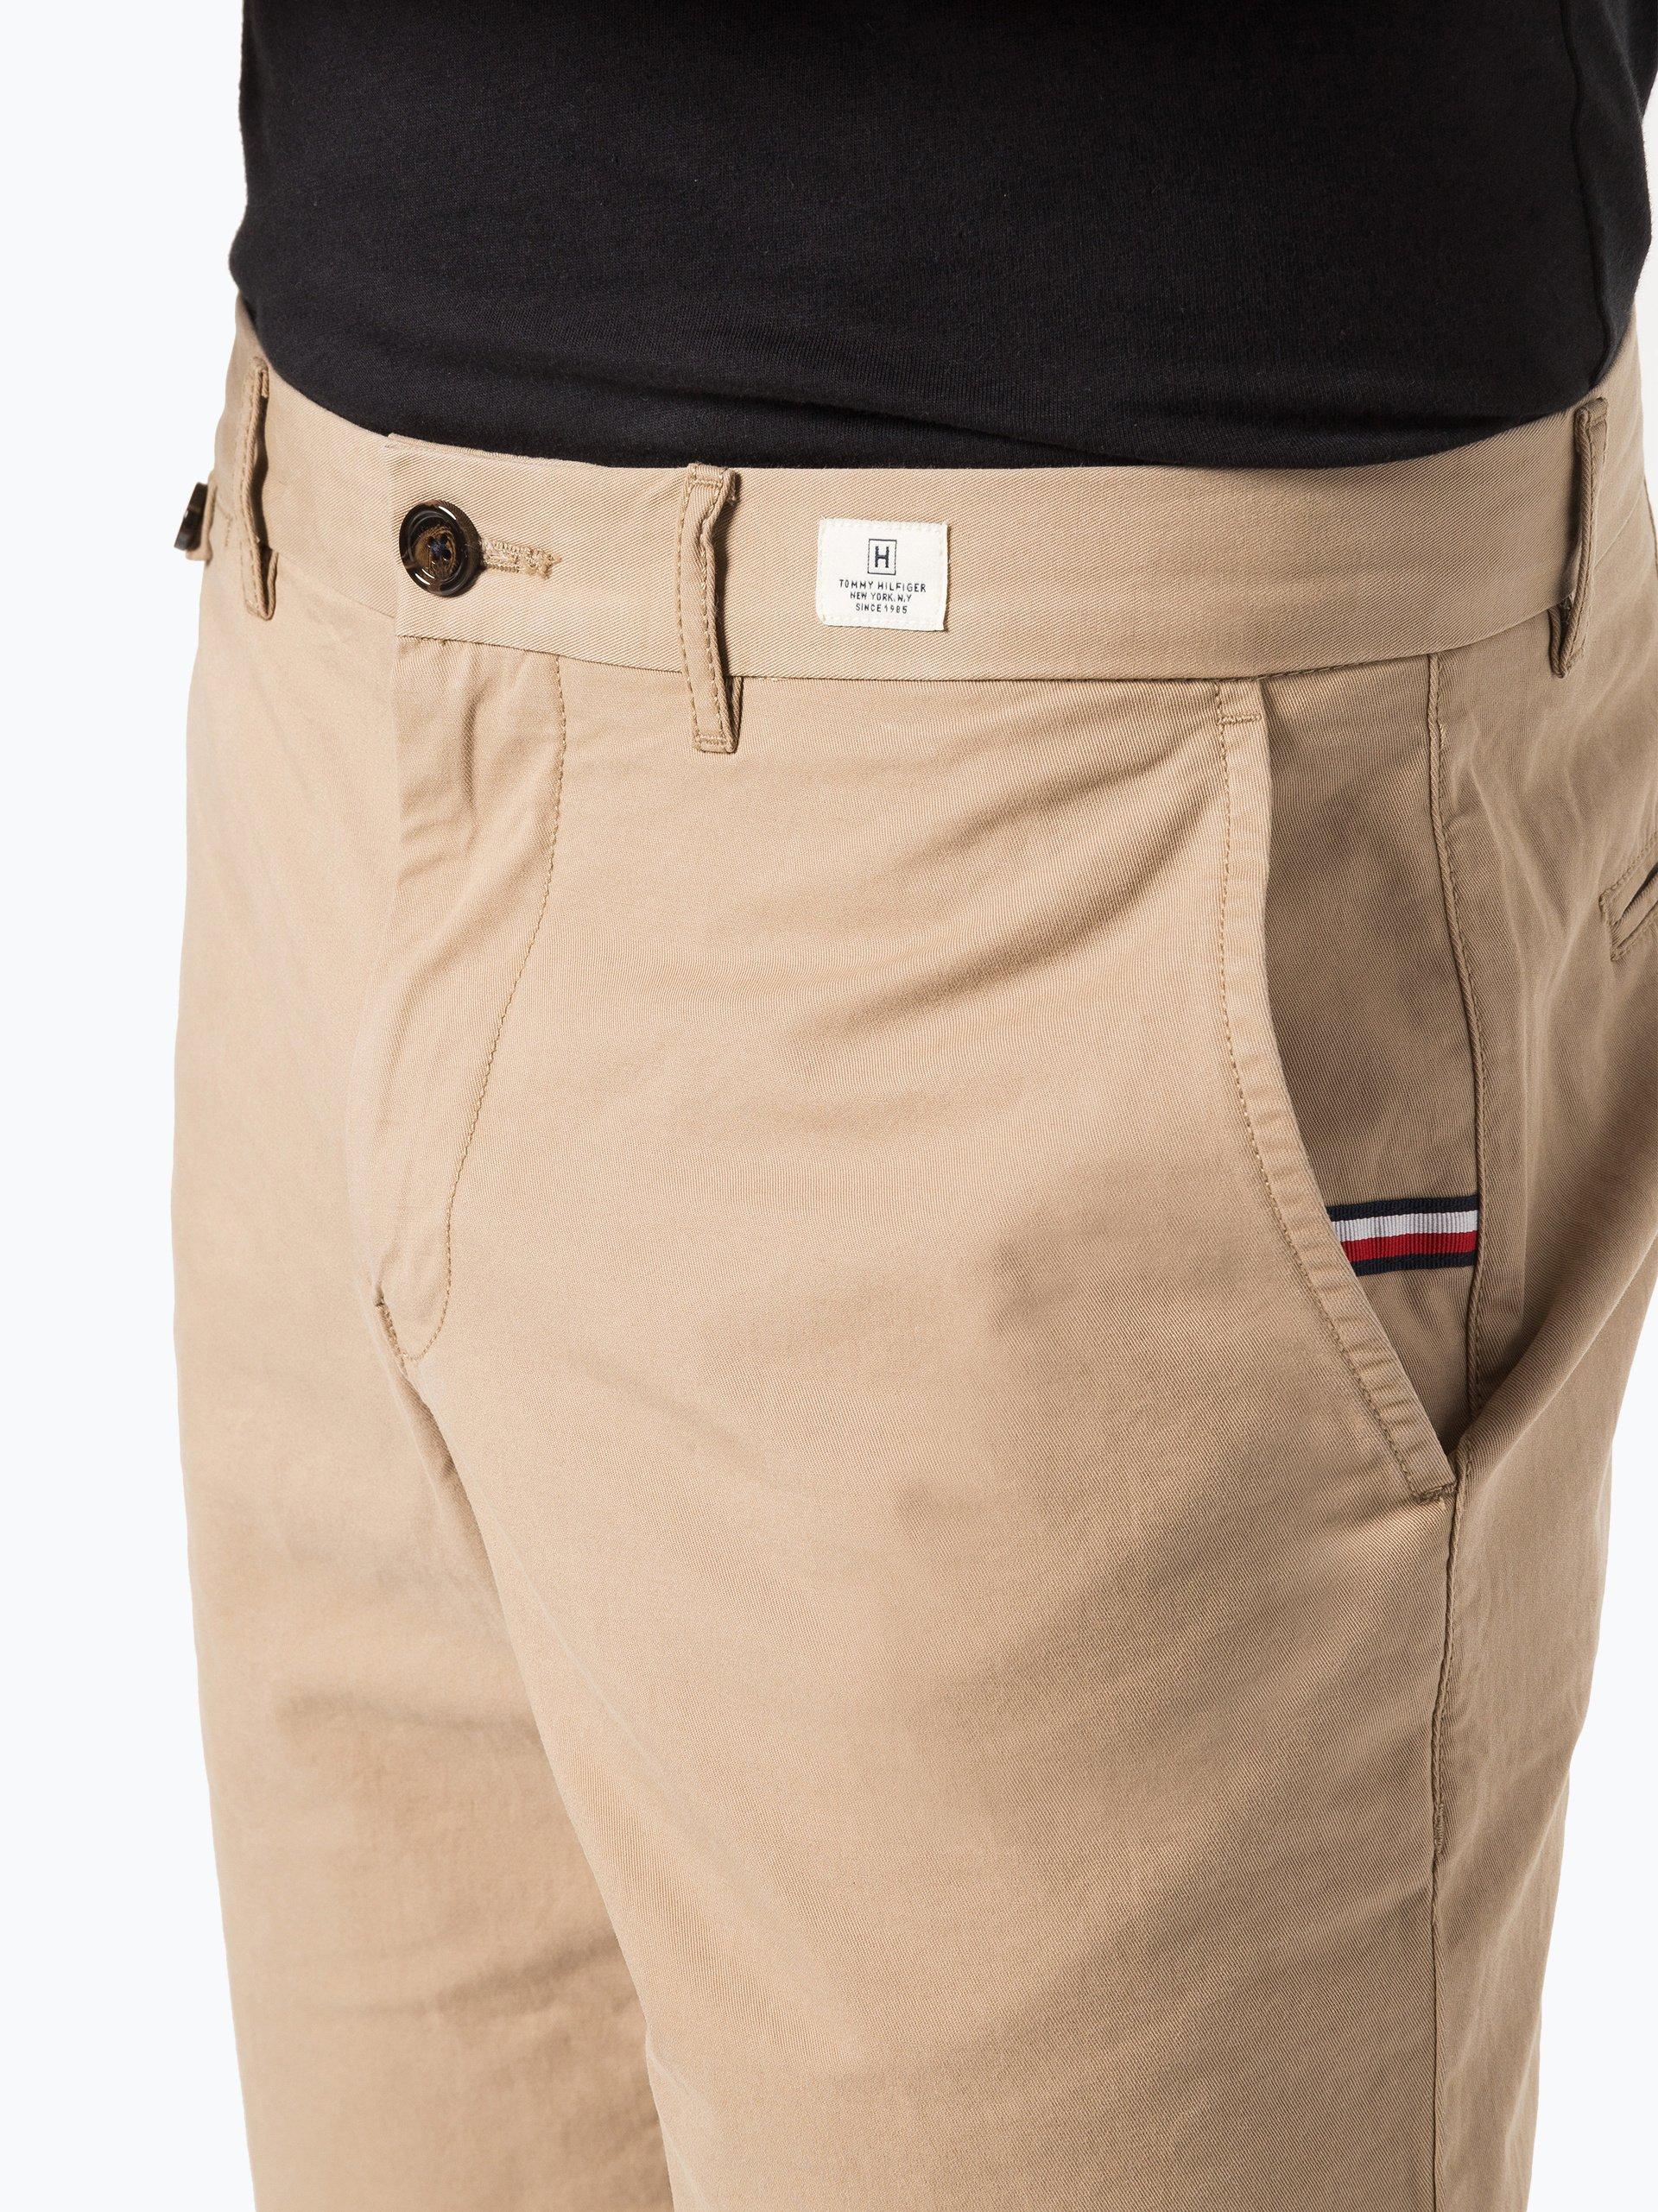 tommy hilfiger herren shorts khaki beige uni online kaufen. Black Bedroom Furniture Sets. Home Design Ideas